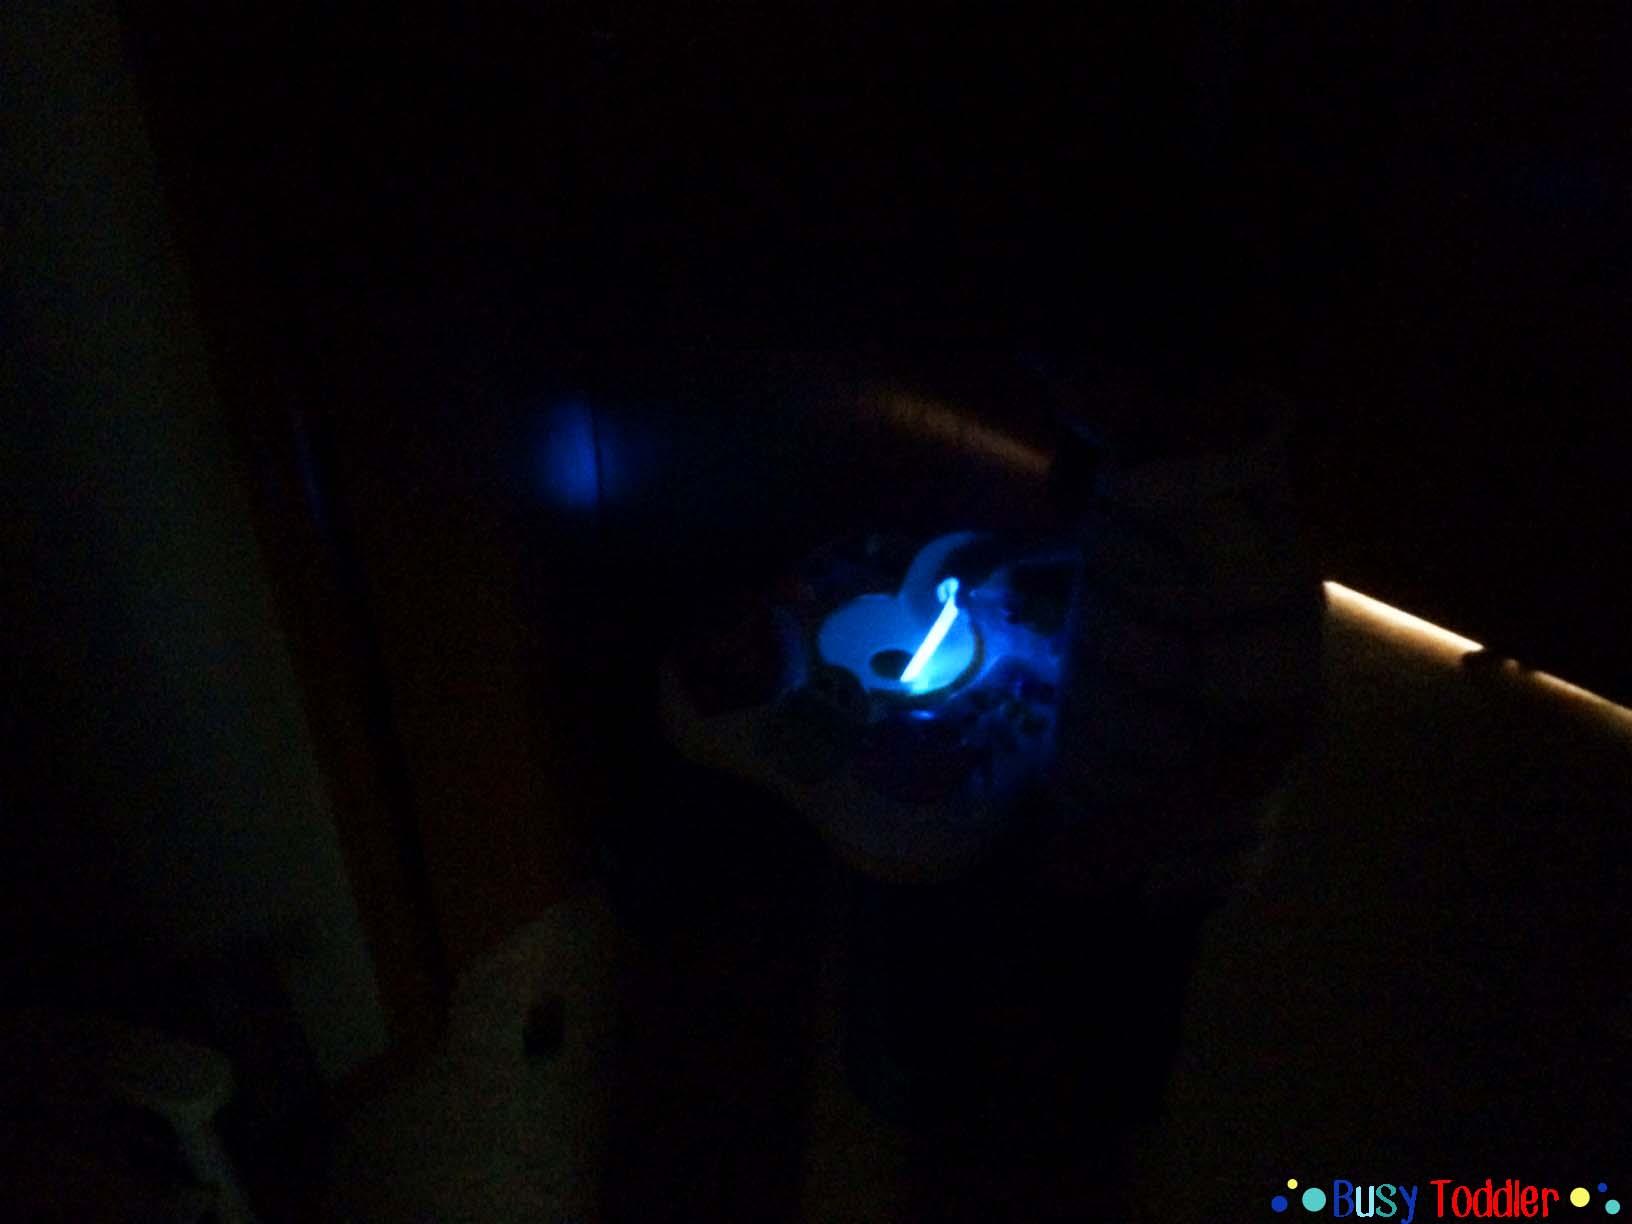 Glow Stick Hide and Seek: a fun, spooky halloween activity